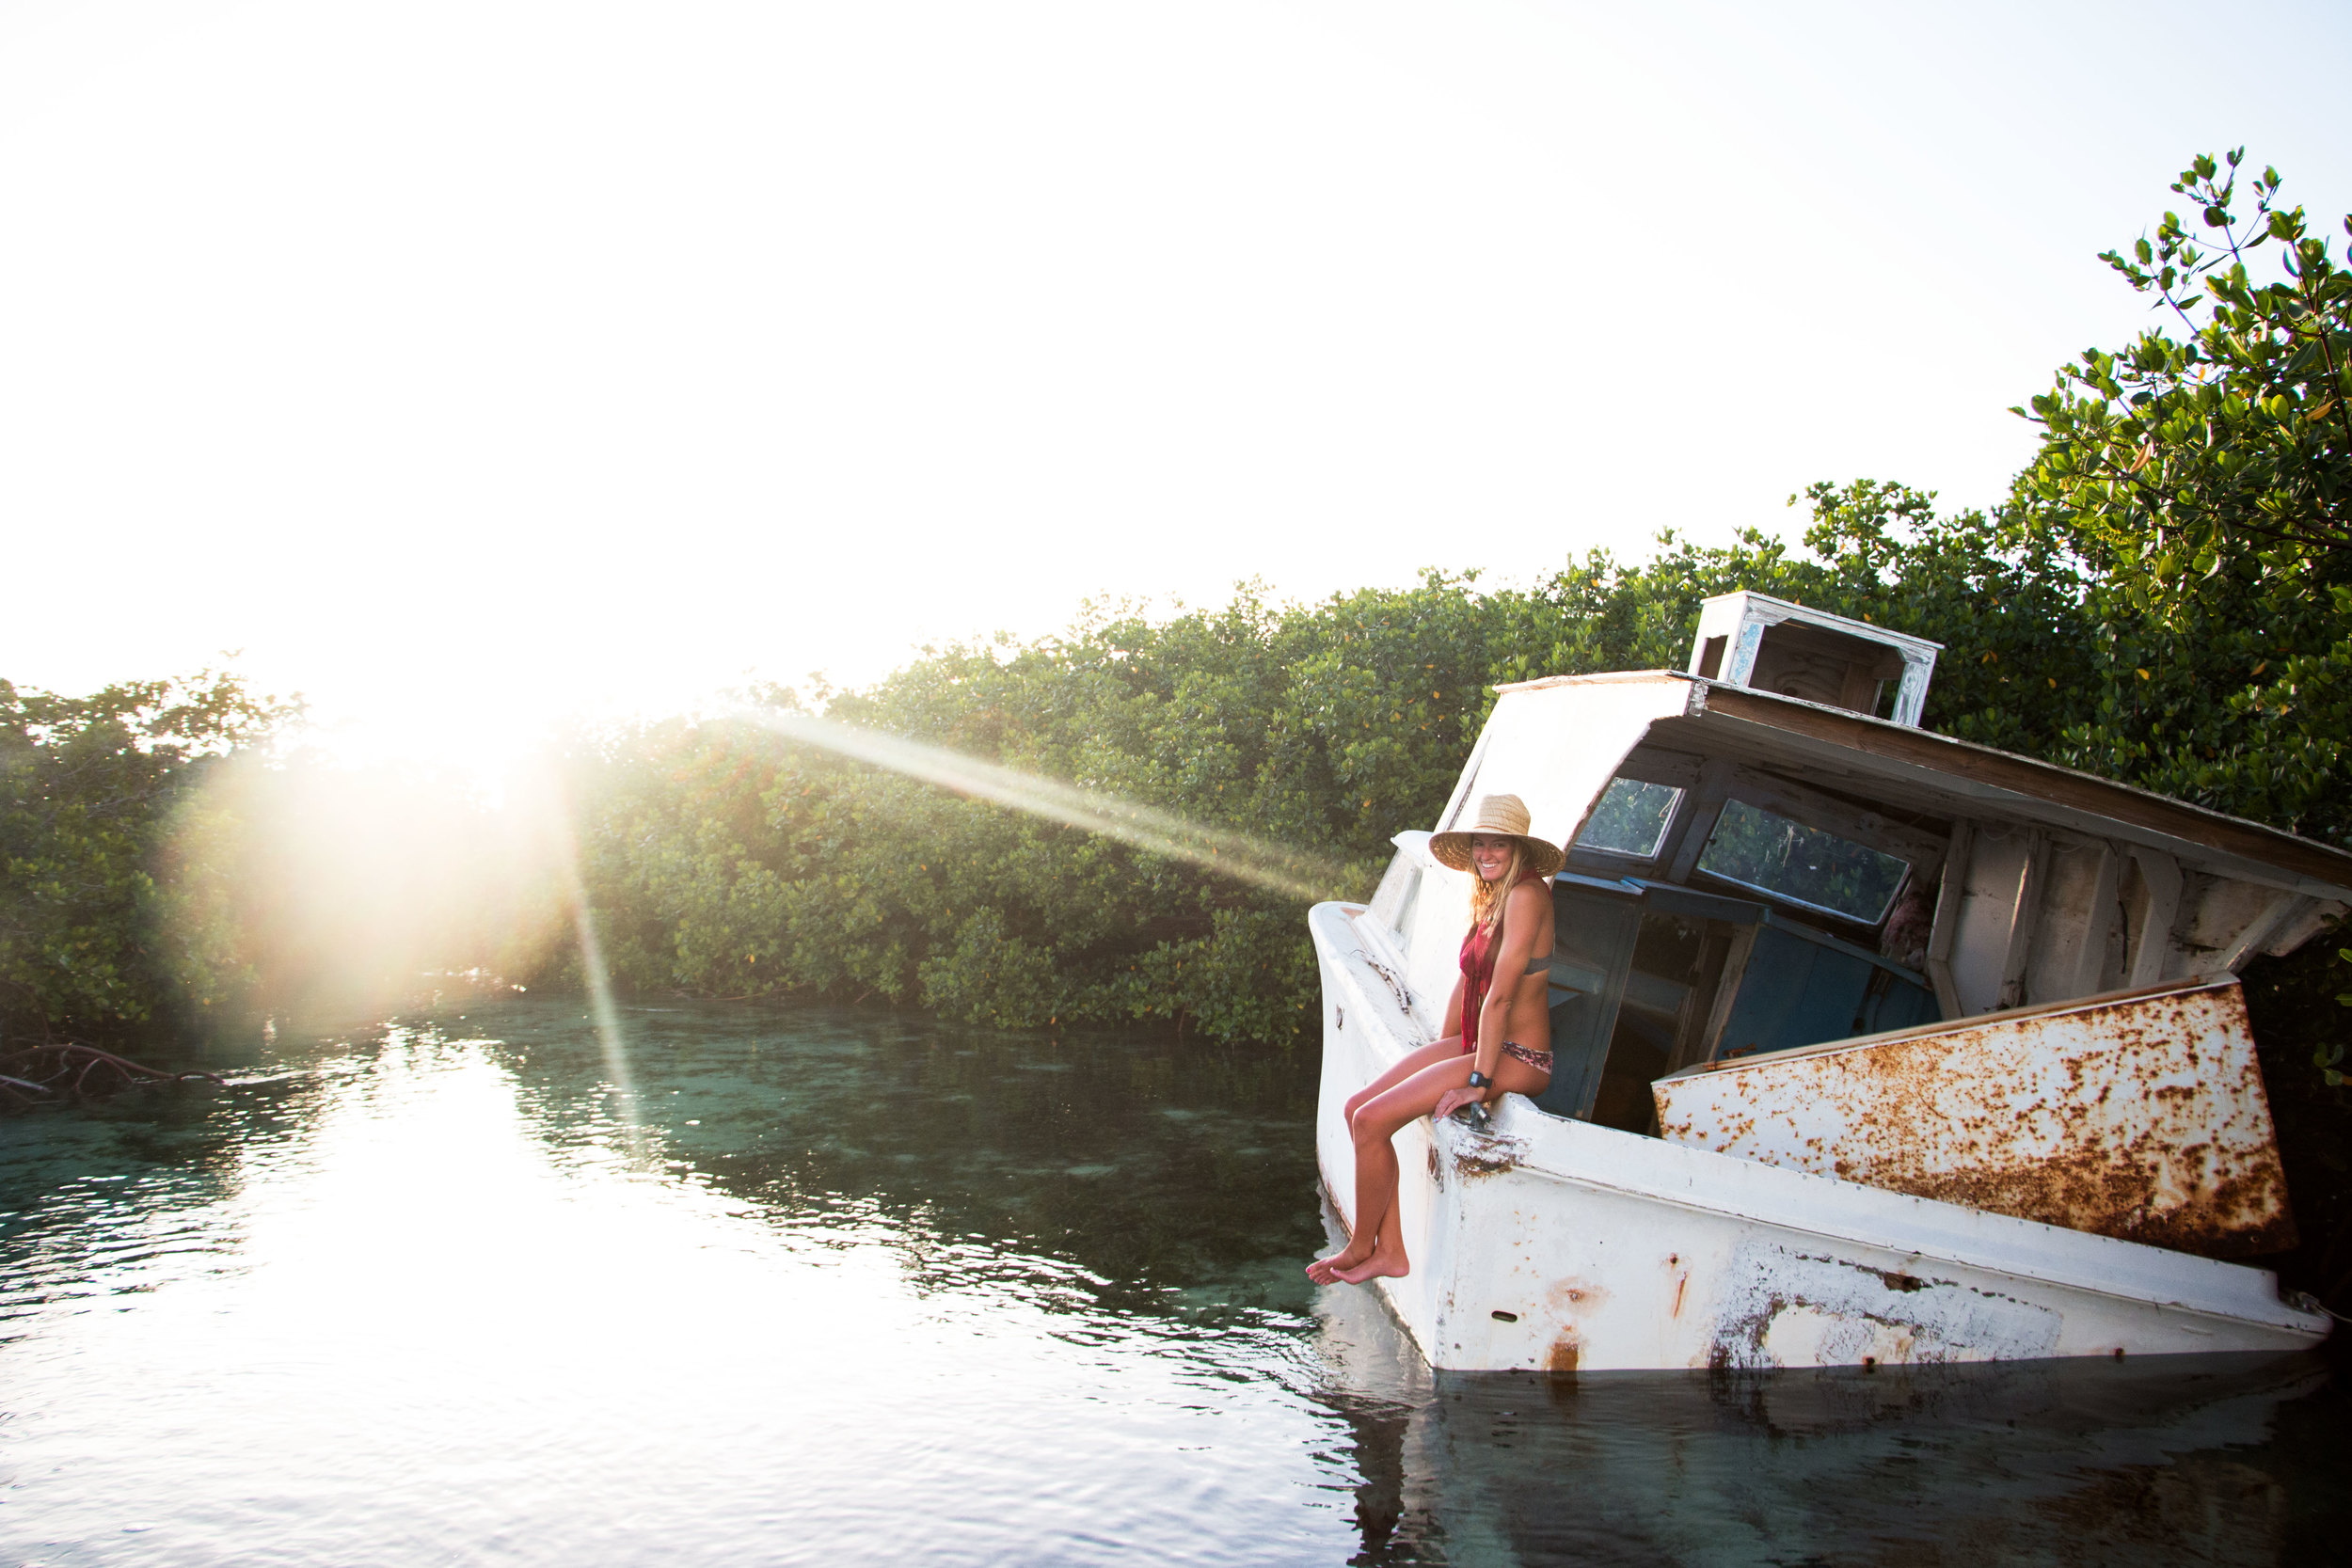 cam_boat1.jpg